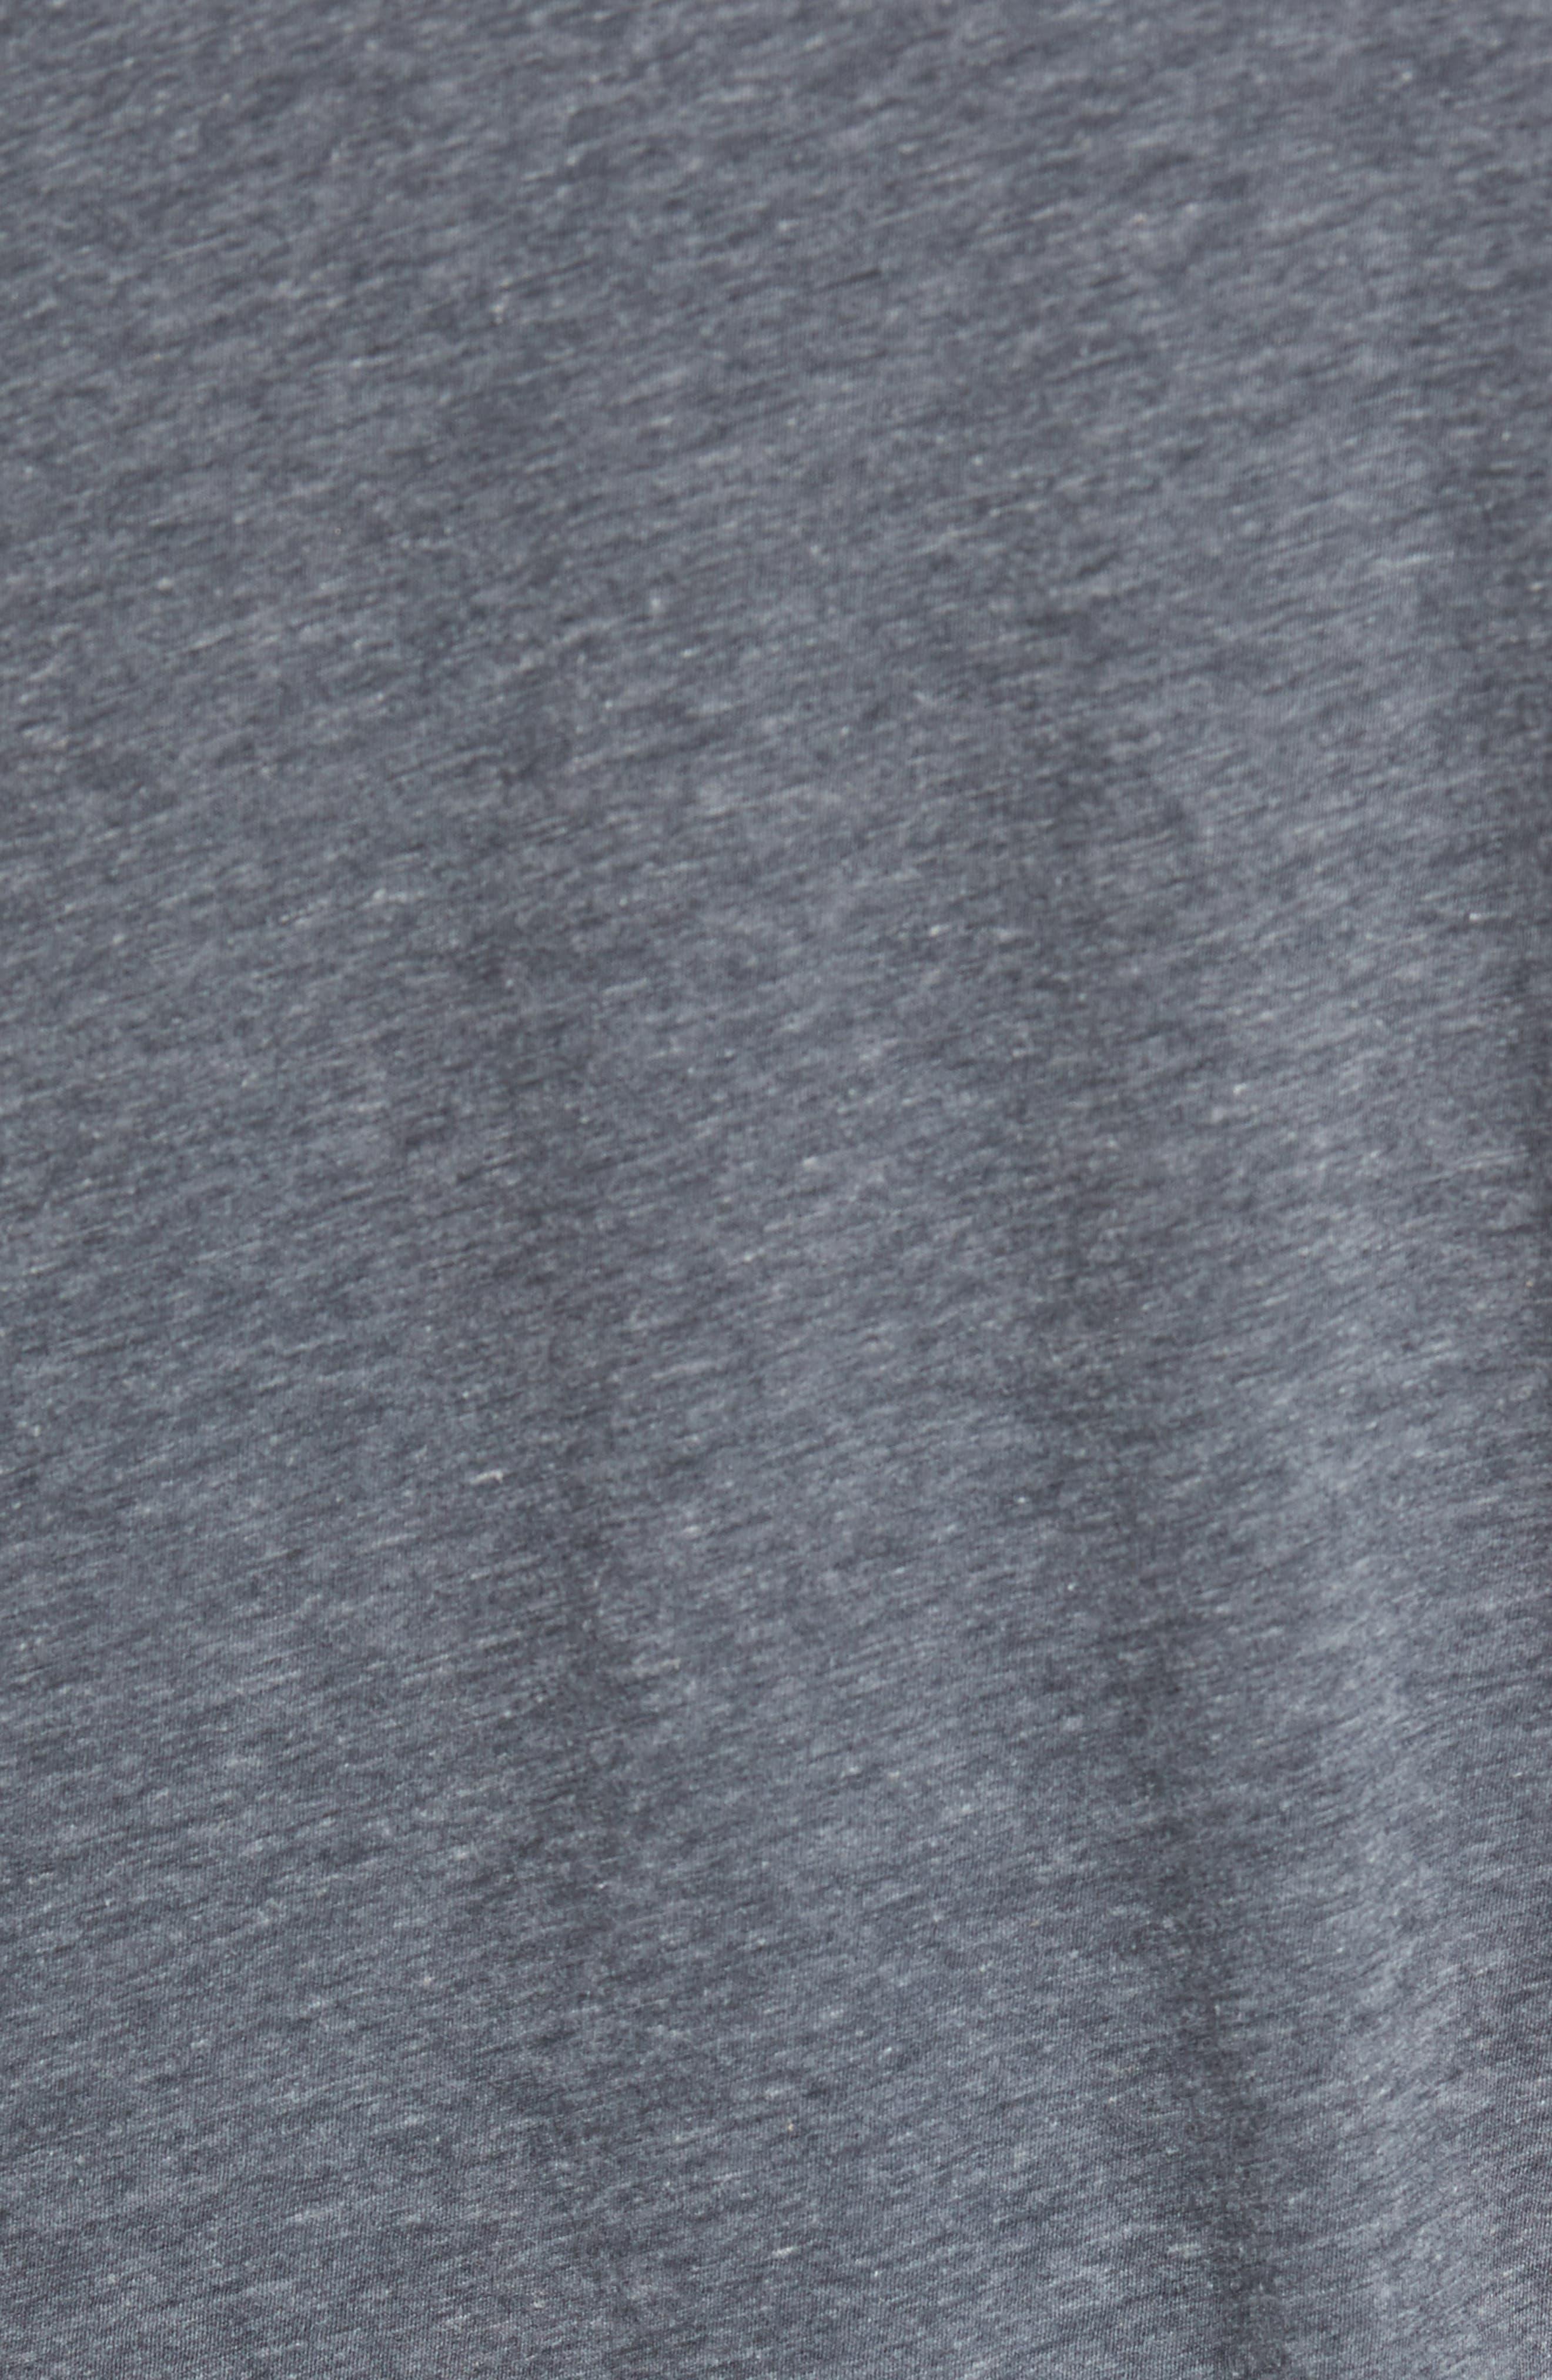 Mélange Long Sleeve Graphic T-Shirt,                             Alternate thumbnail 5, color,                             007